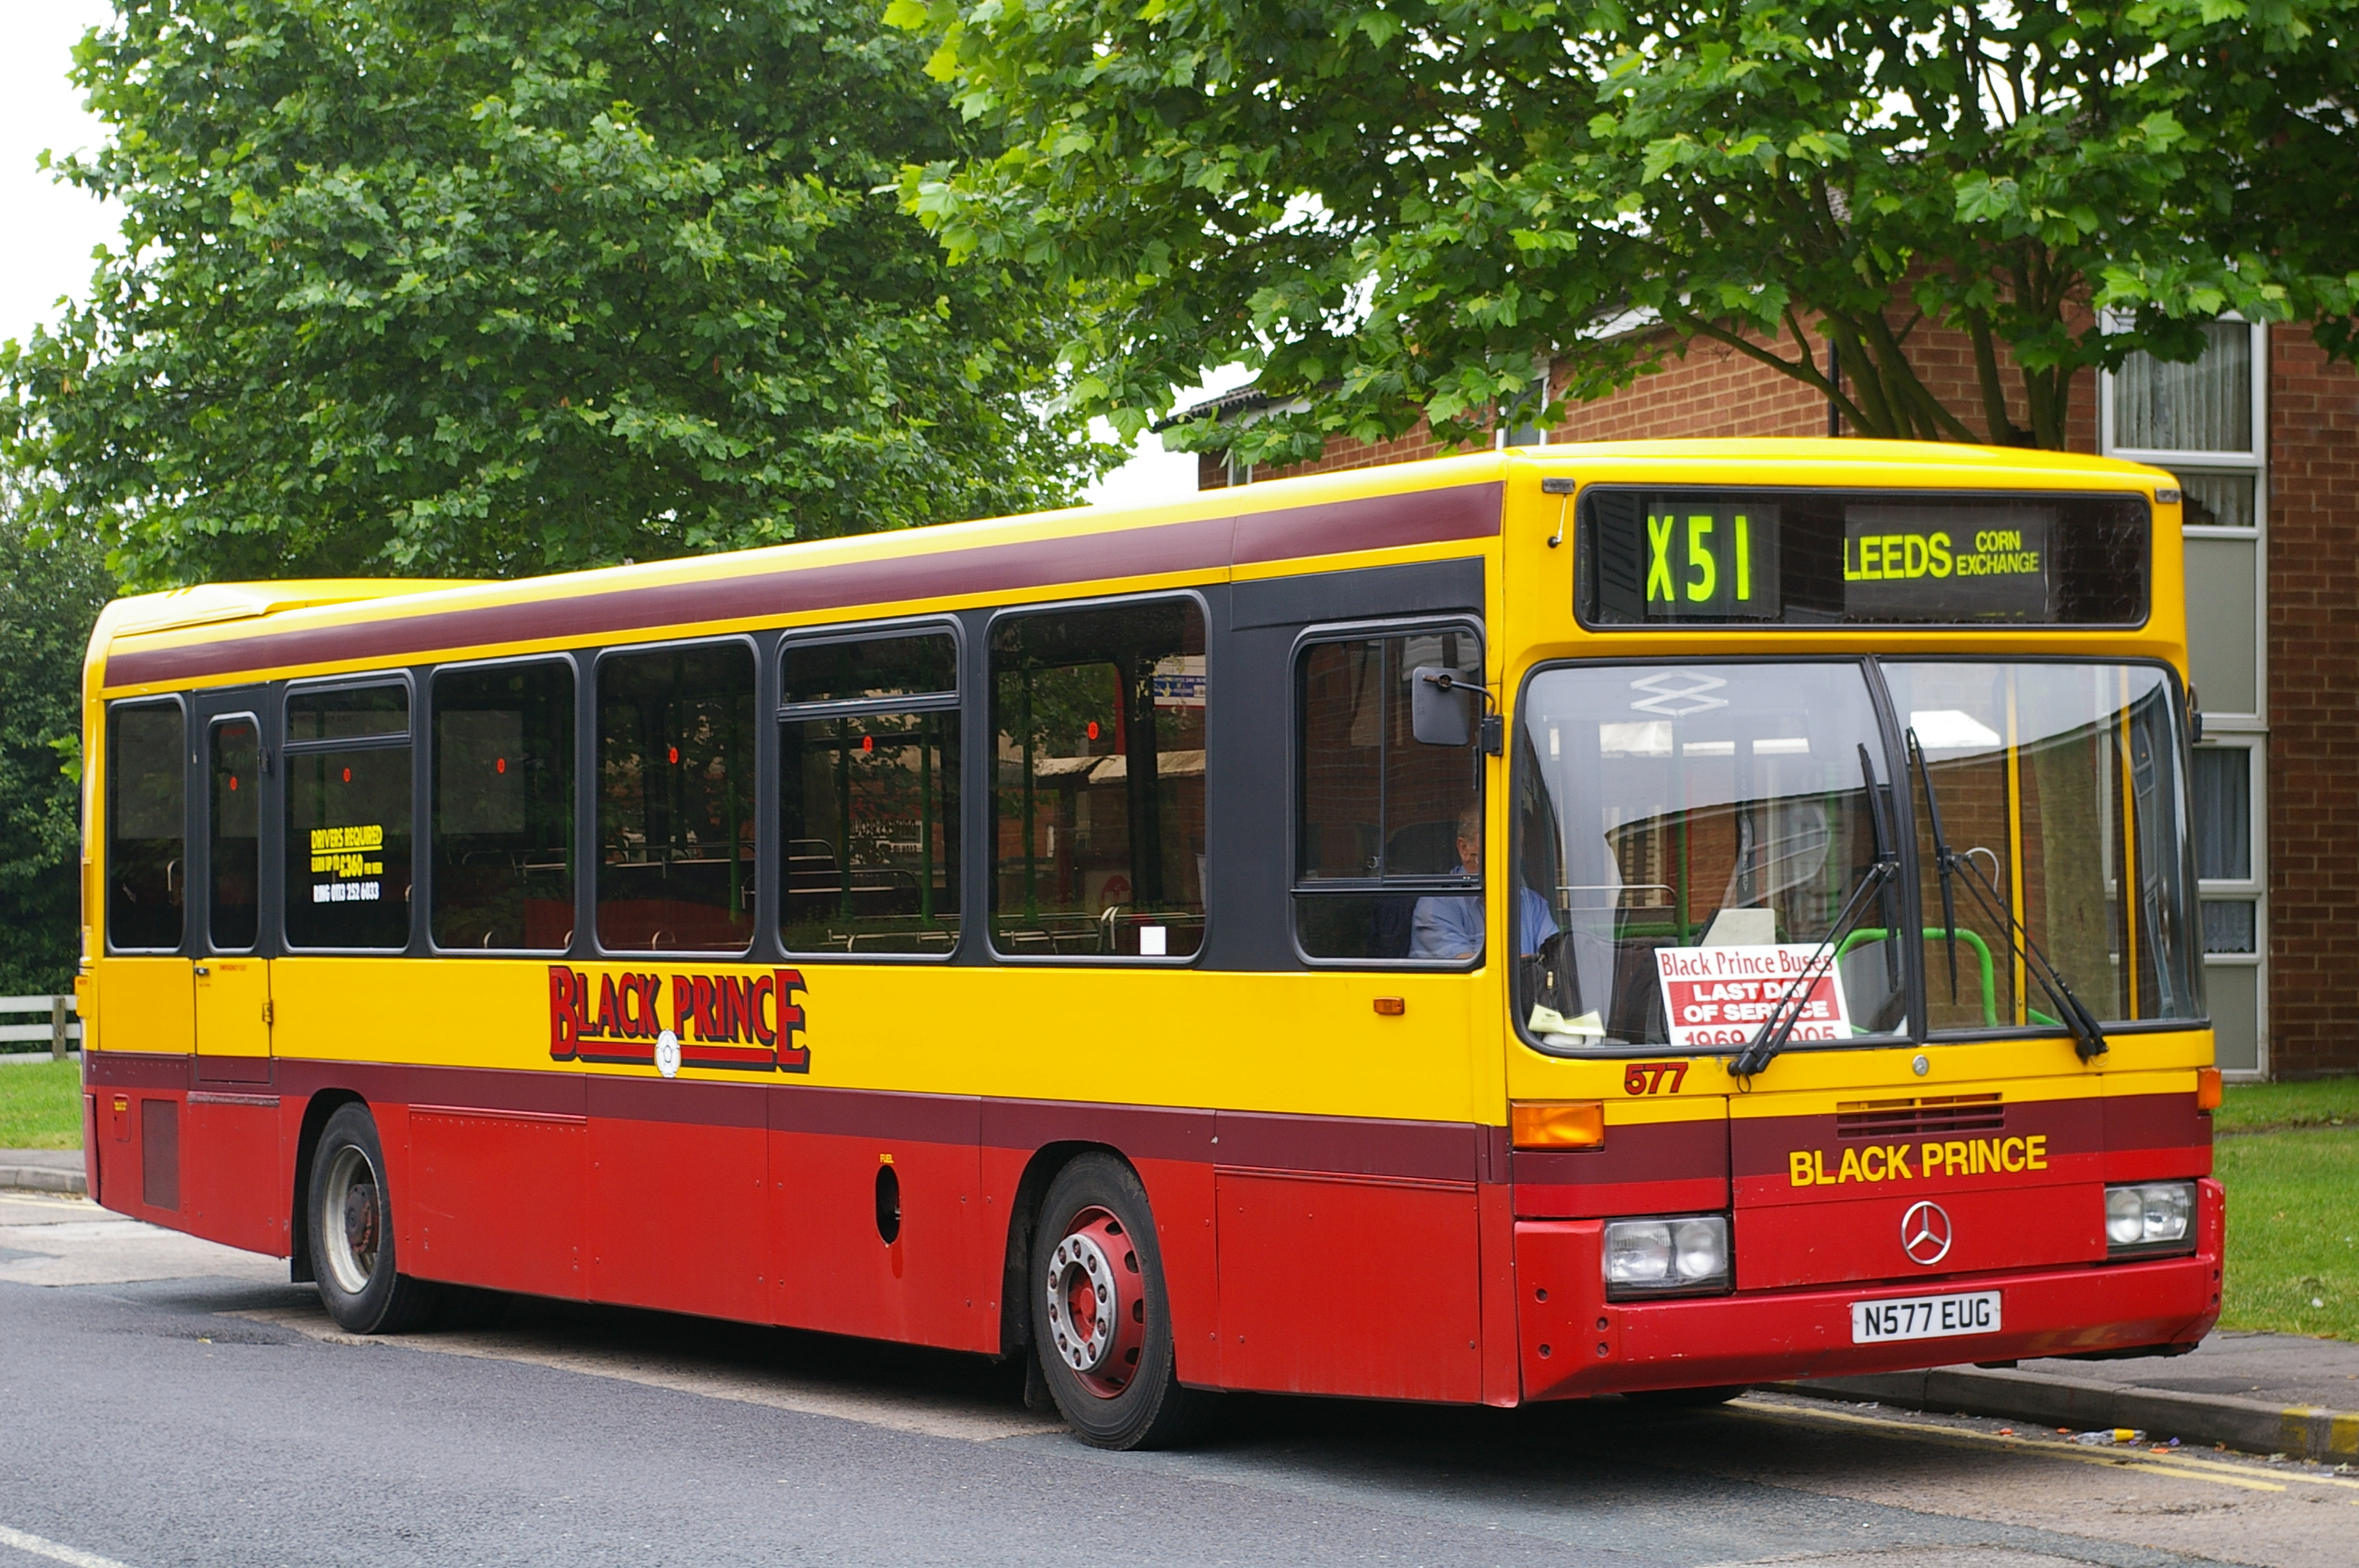 N577EUG